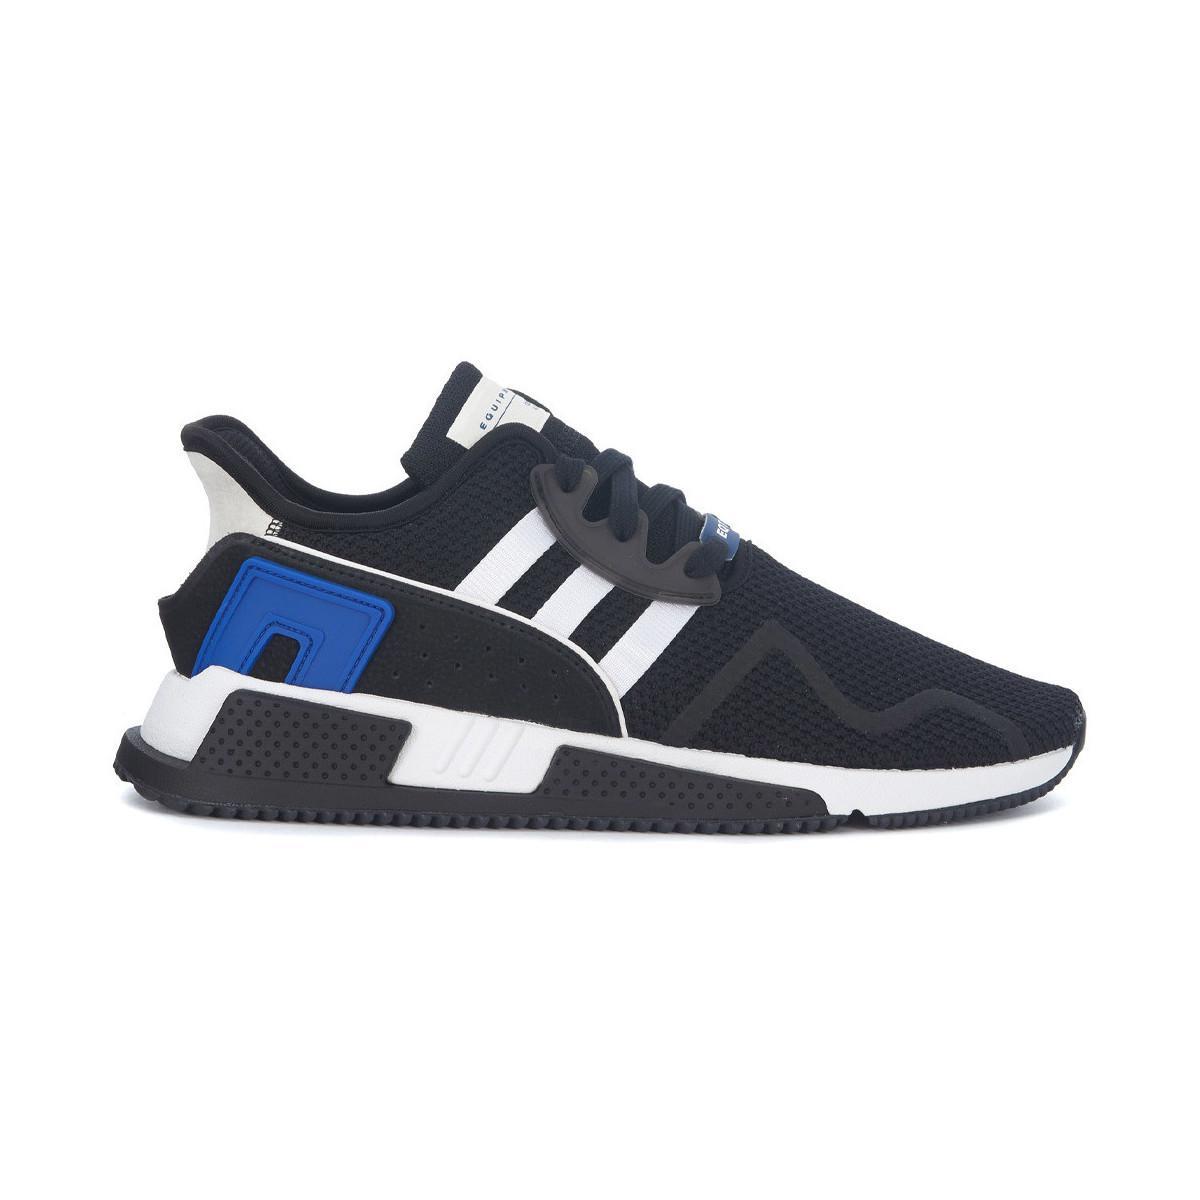 premium selection 47b47 d1164 adidas. Trainer Eqt Cushion Con Tomaia Knit ...